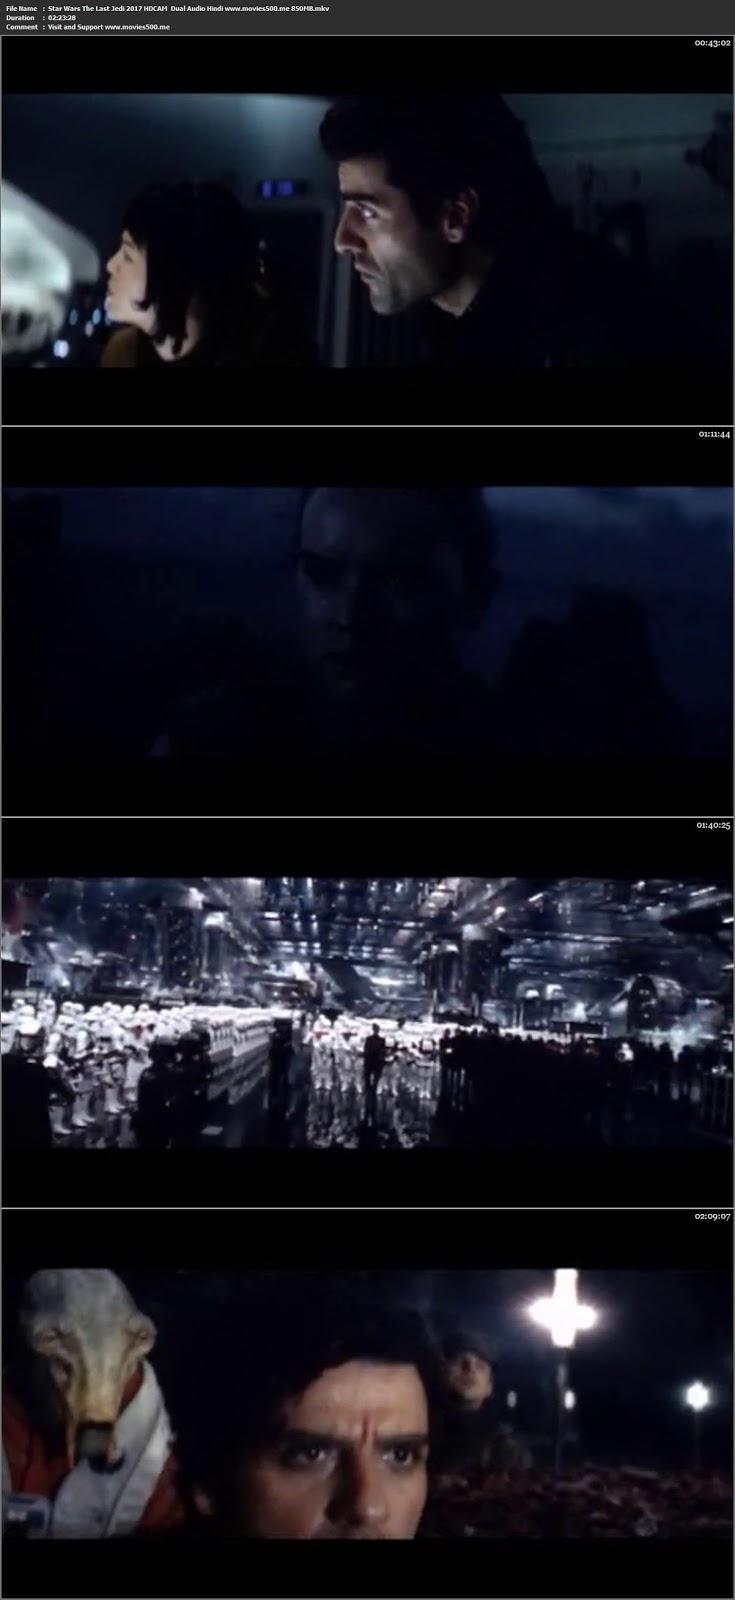 Star Wars The Last Jedi 2017 Dual Audio Hindi HDCAM 720p at movies500.me